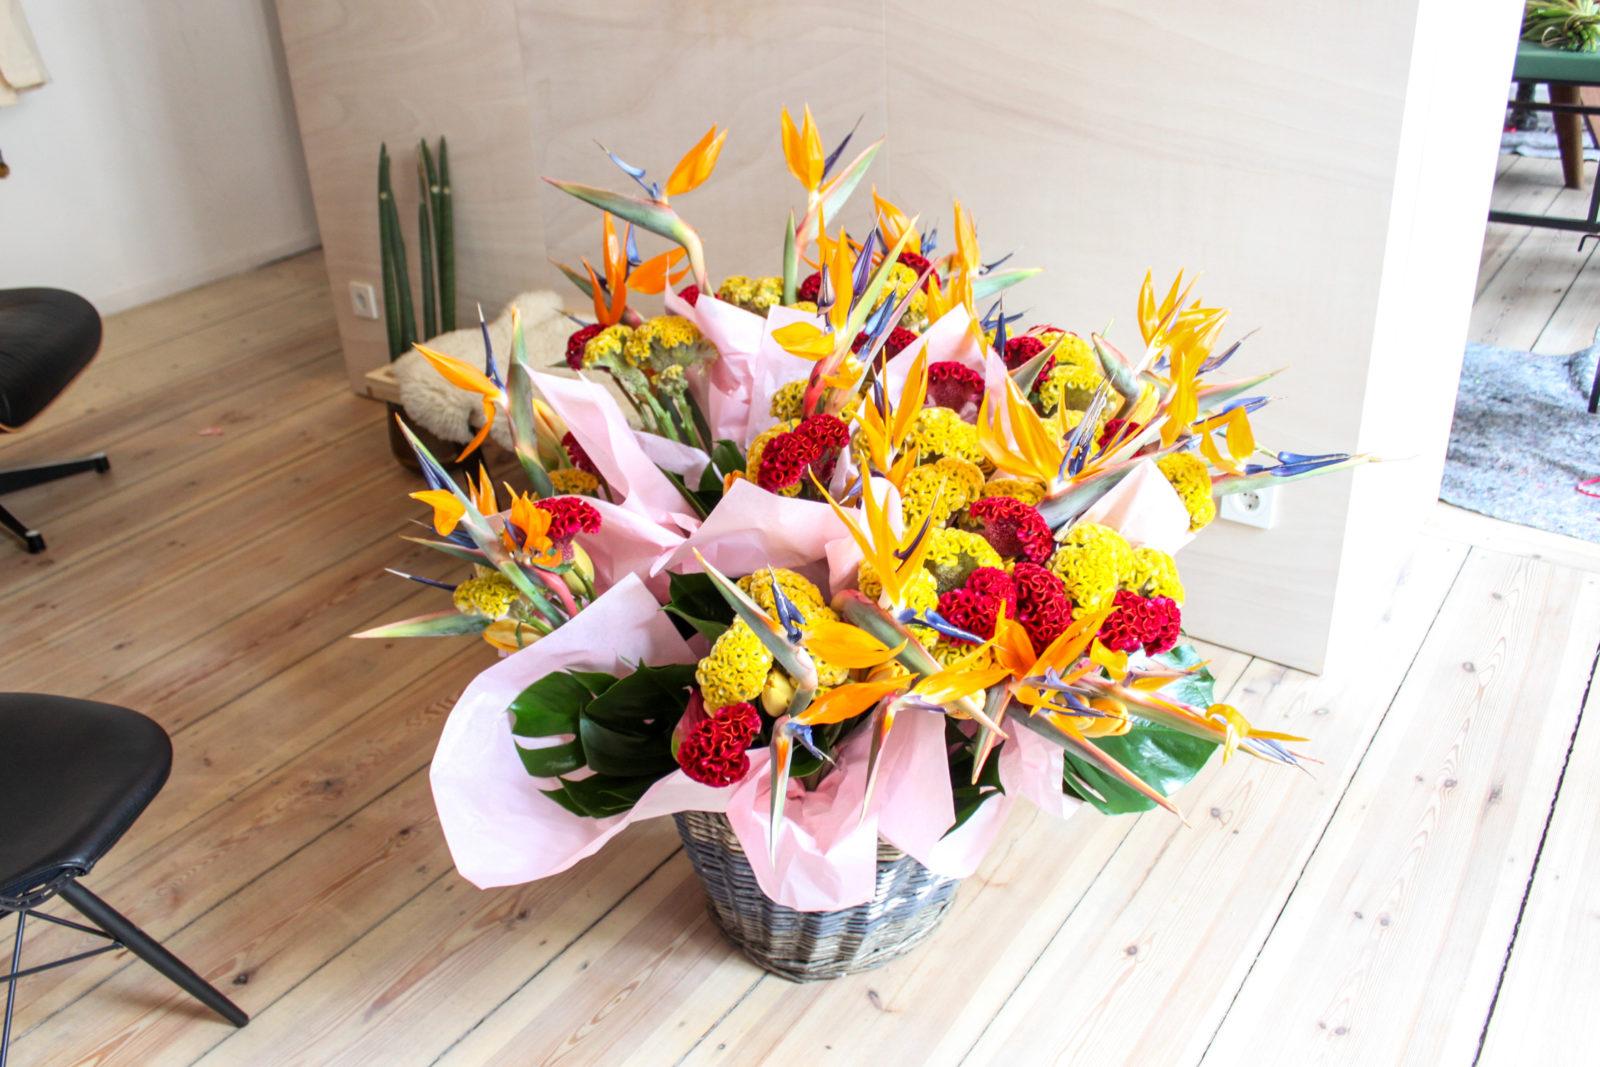 Marsano flower workshop at the FvF Apartment